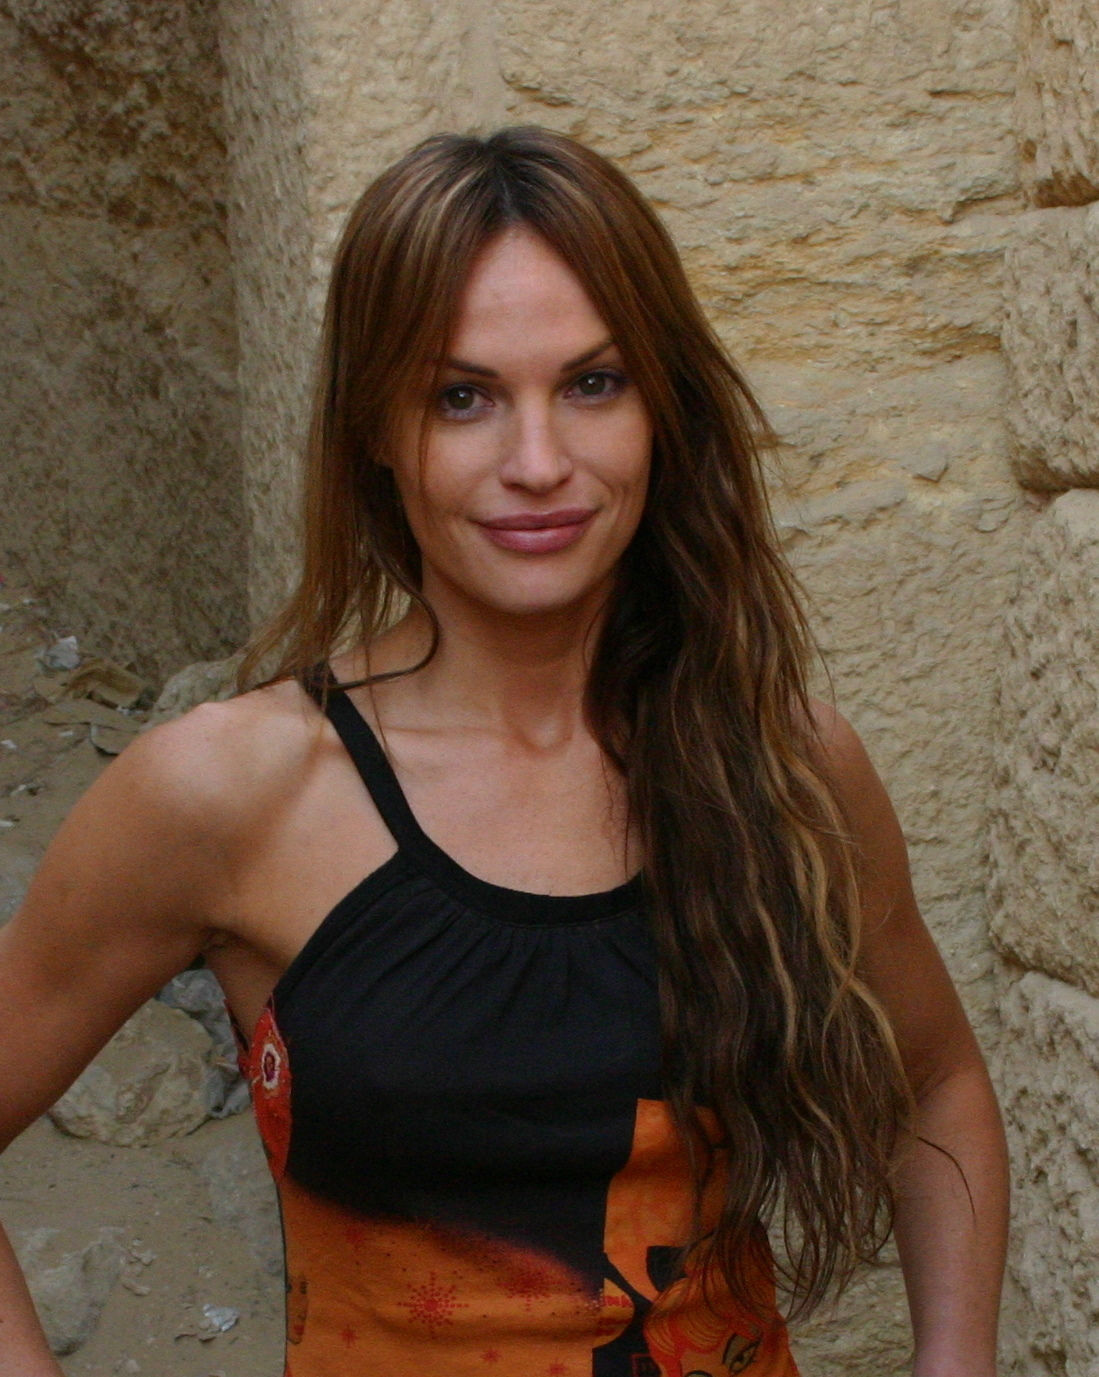 Photo of Jolene Blalock: Actress